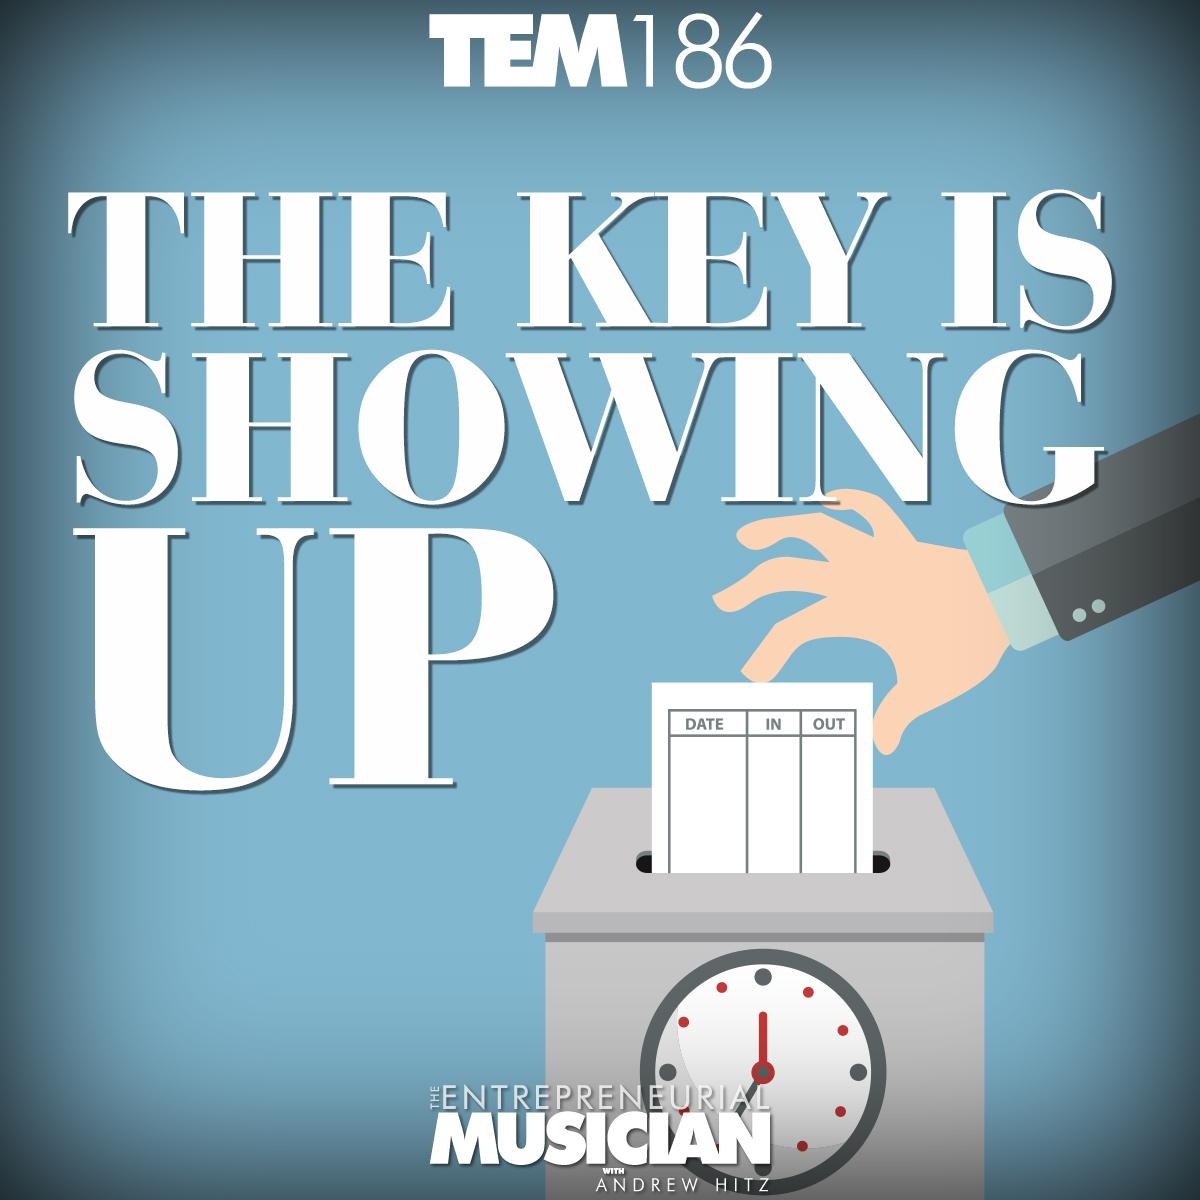 TEM186-Promo.jpg